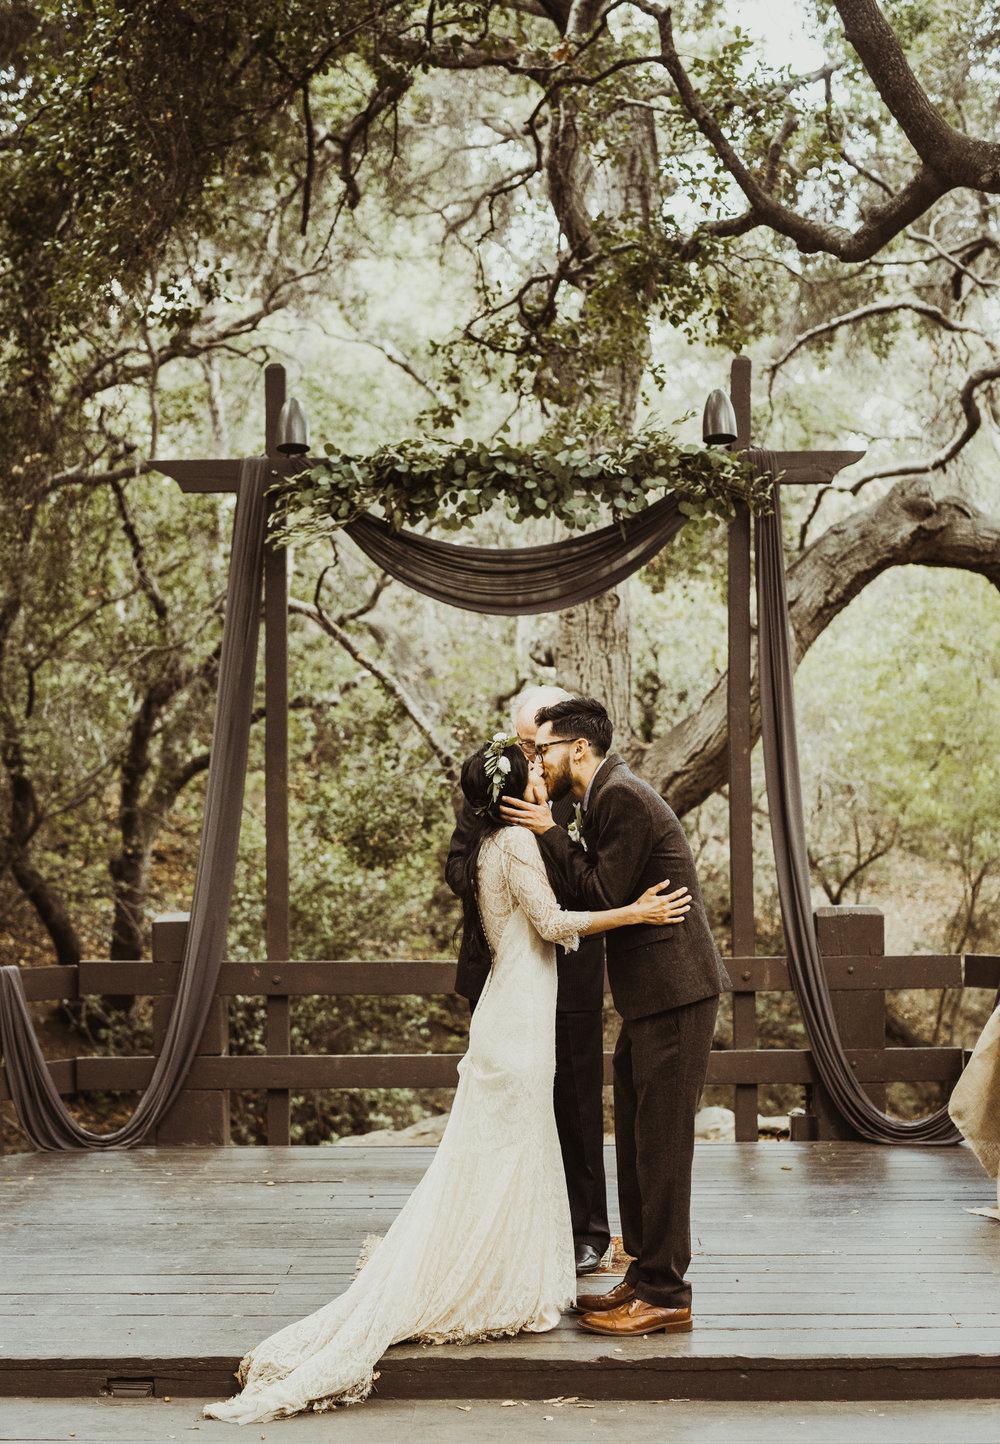 ©Isaiah-&-Taylor-Photography---Oak-Canyon-Nature-Center-Wedding,-Anaheim-Hills-051.jpg